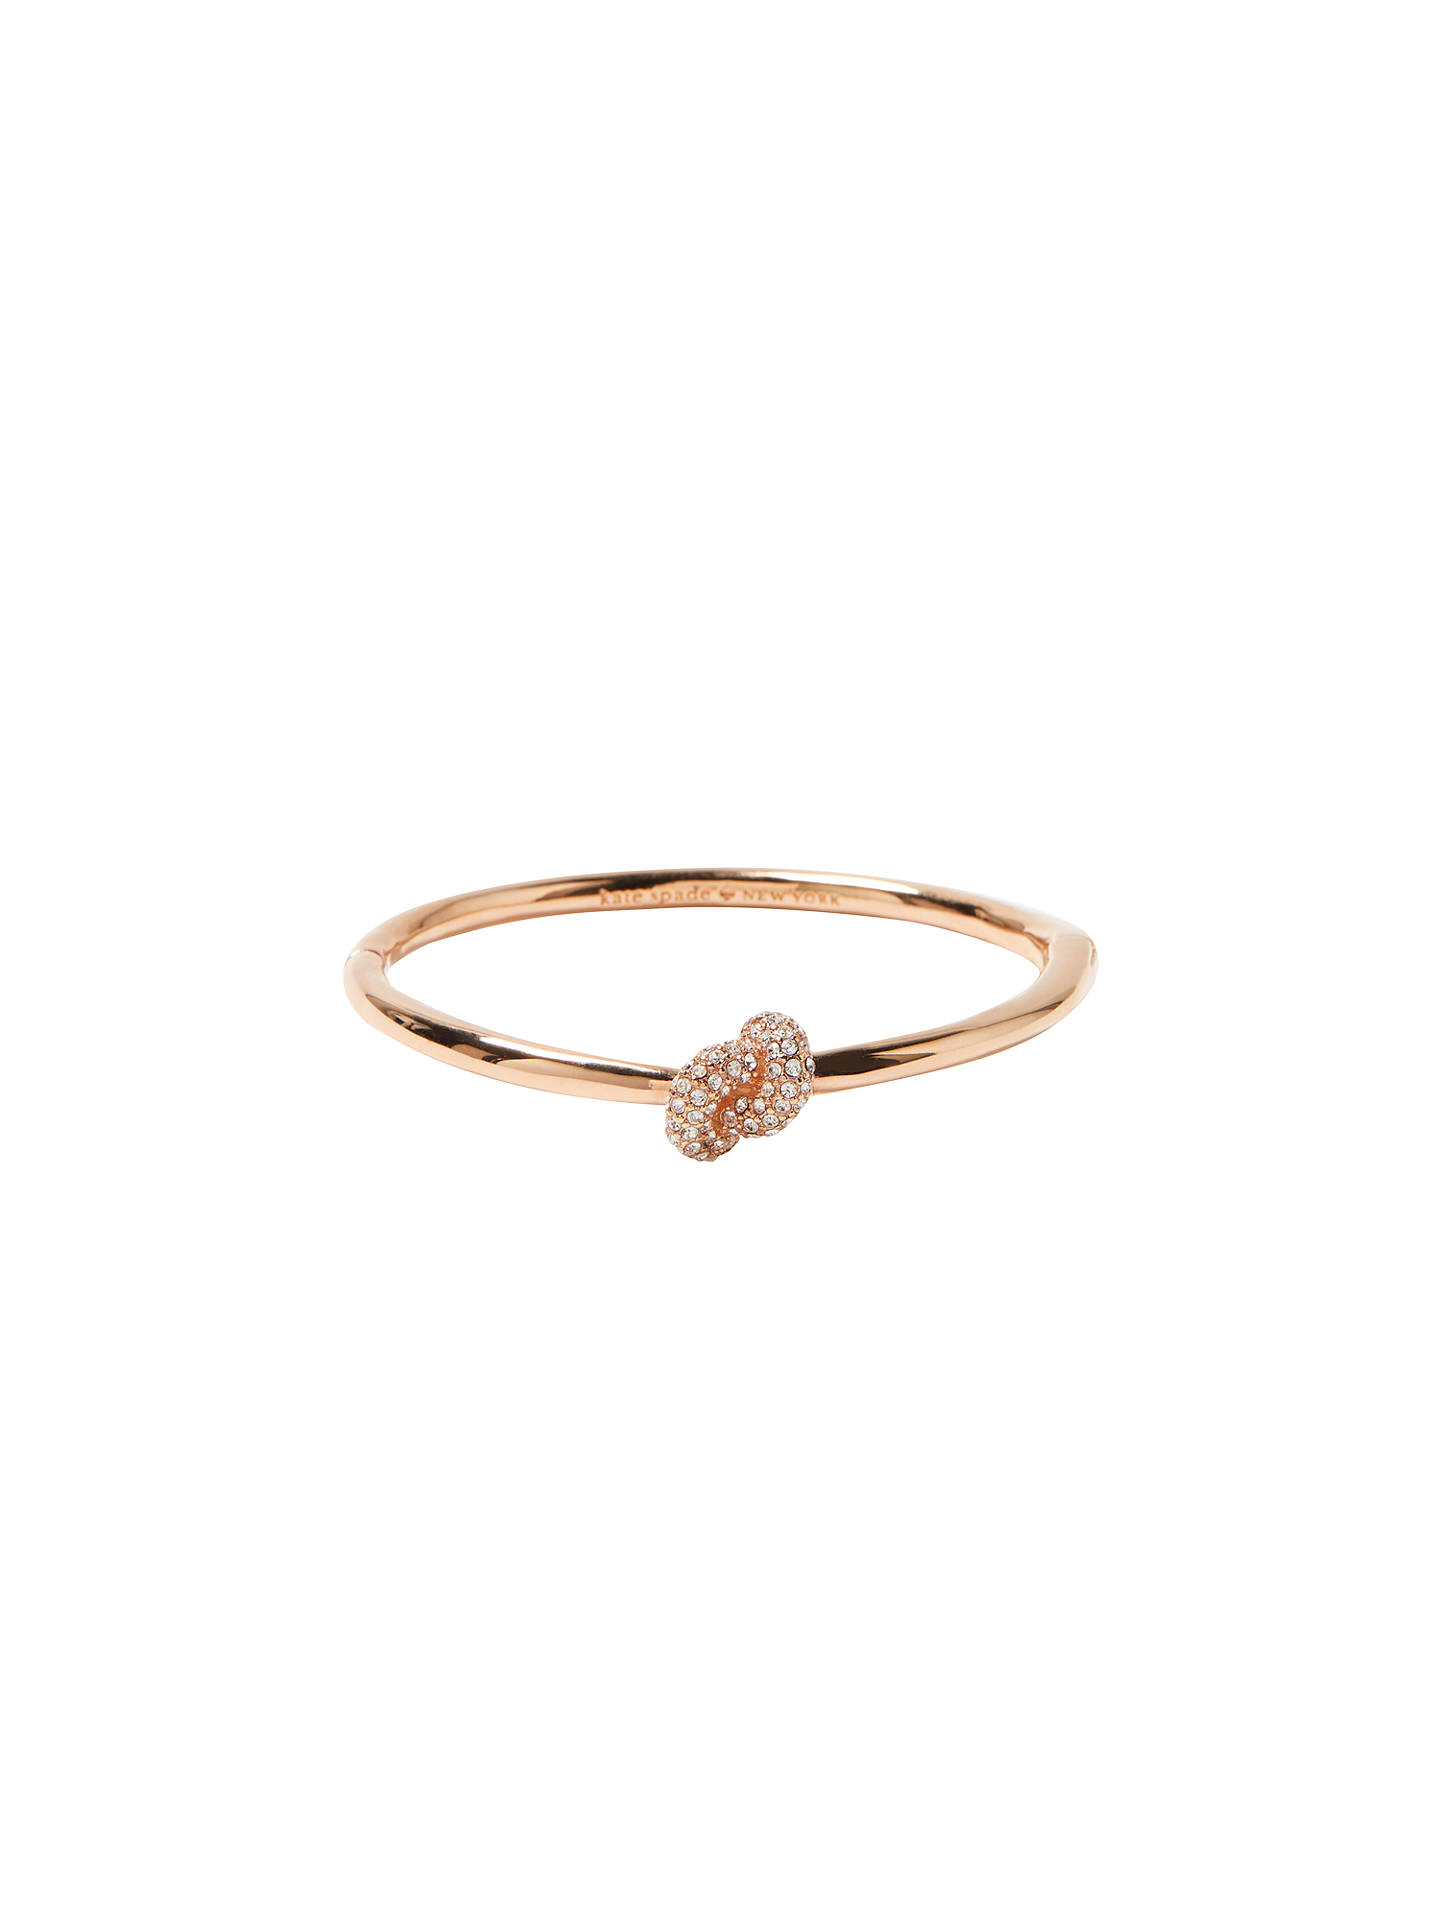 7813aa2b0 Buy kate spade new york Swarovski Crystal Sailors Knot Pave Hinge Bangle,  Rose Gold Online ...